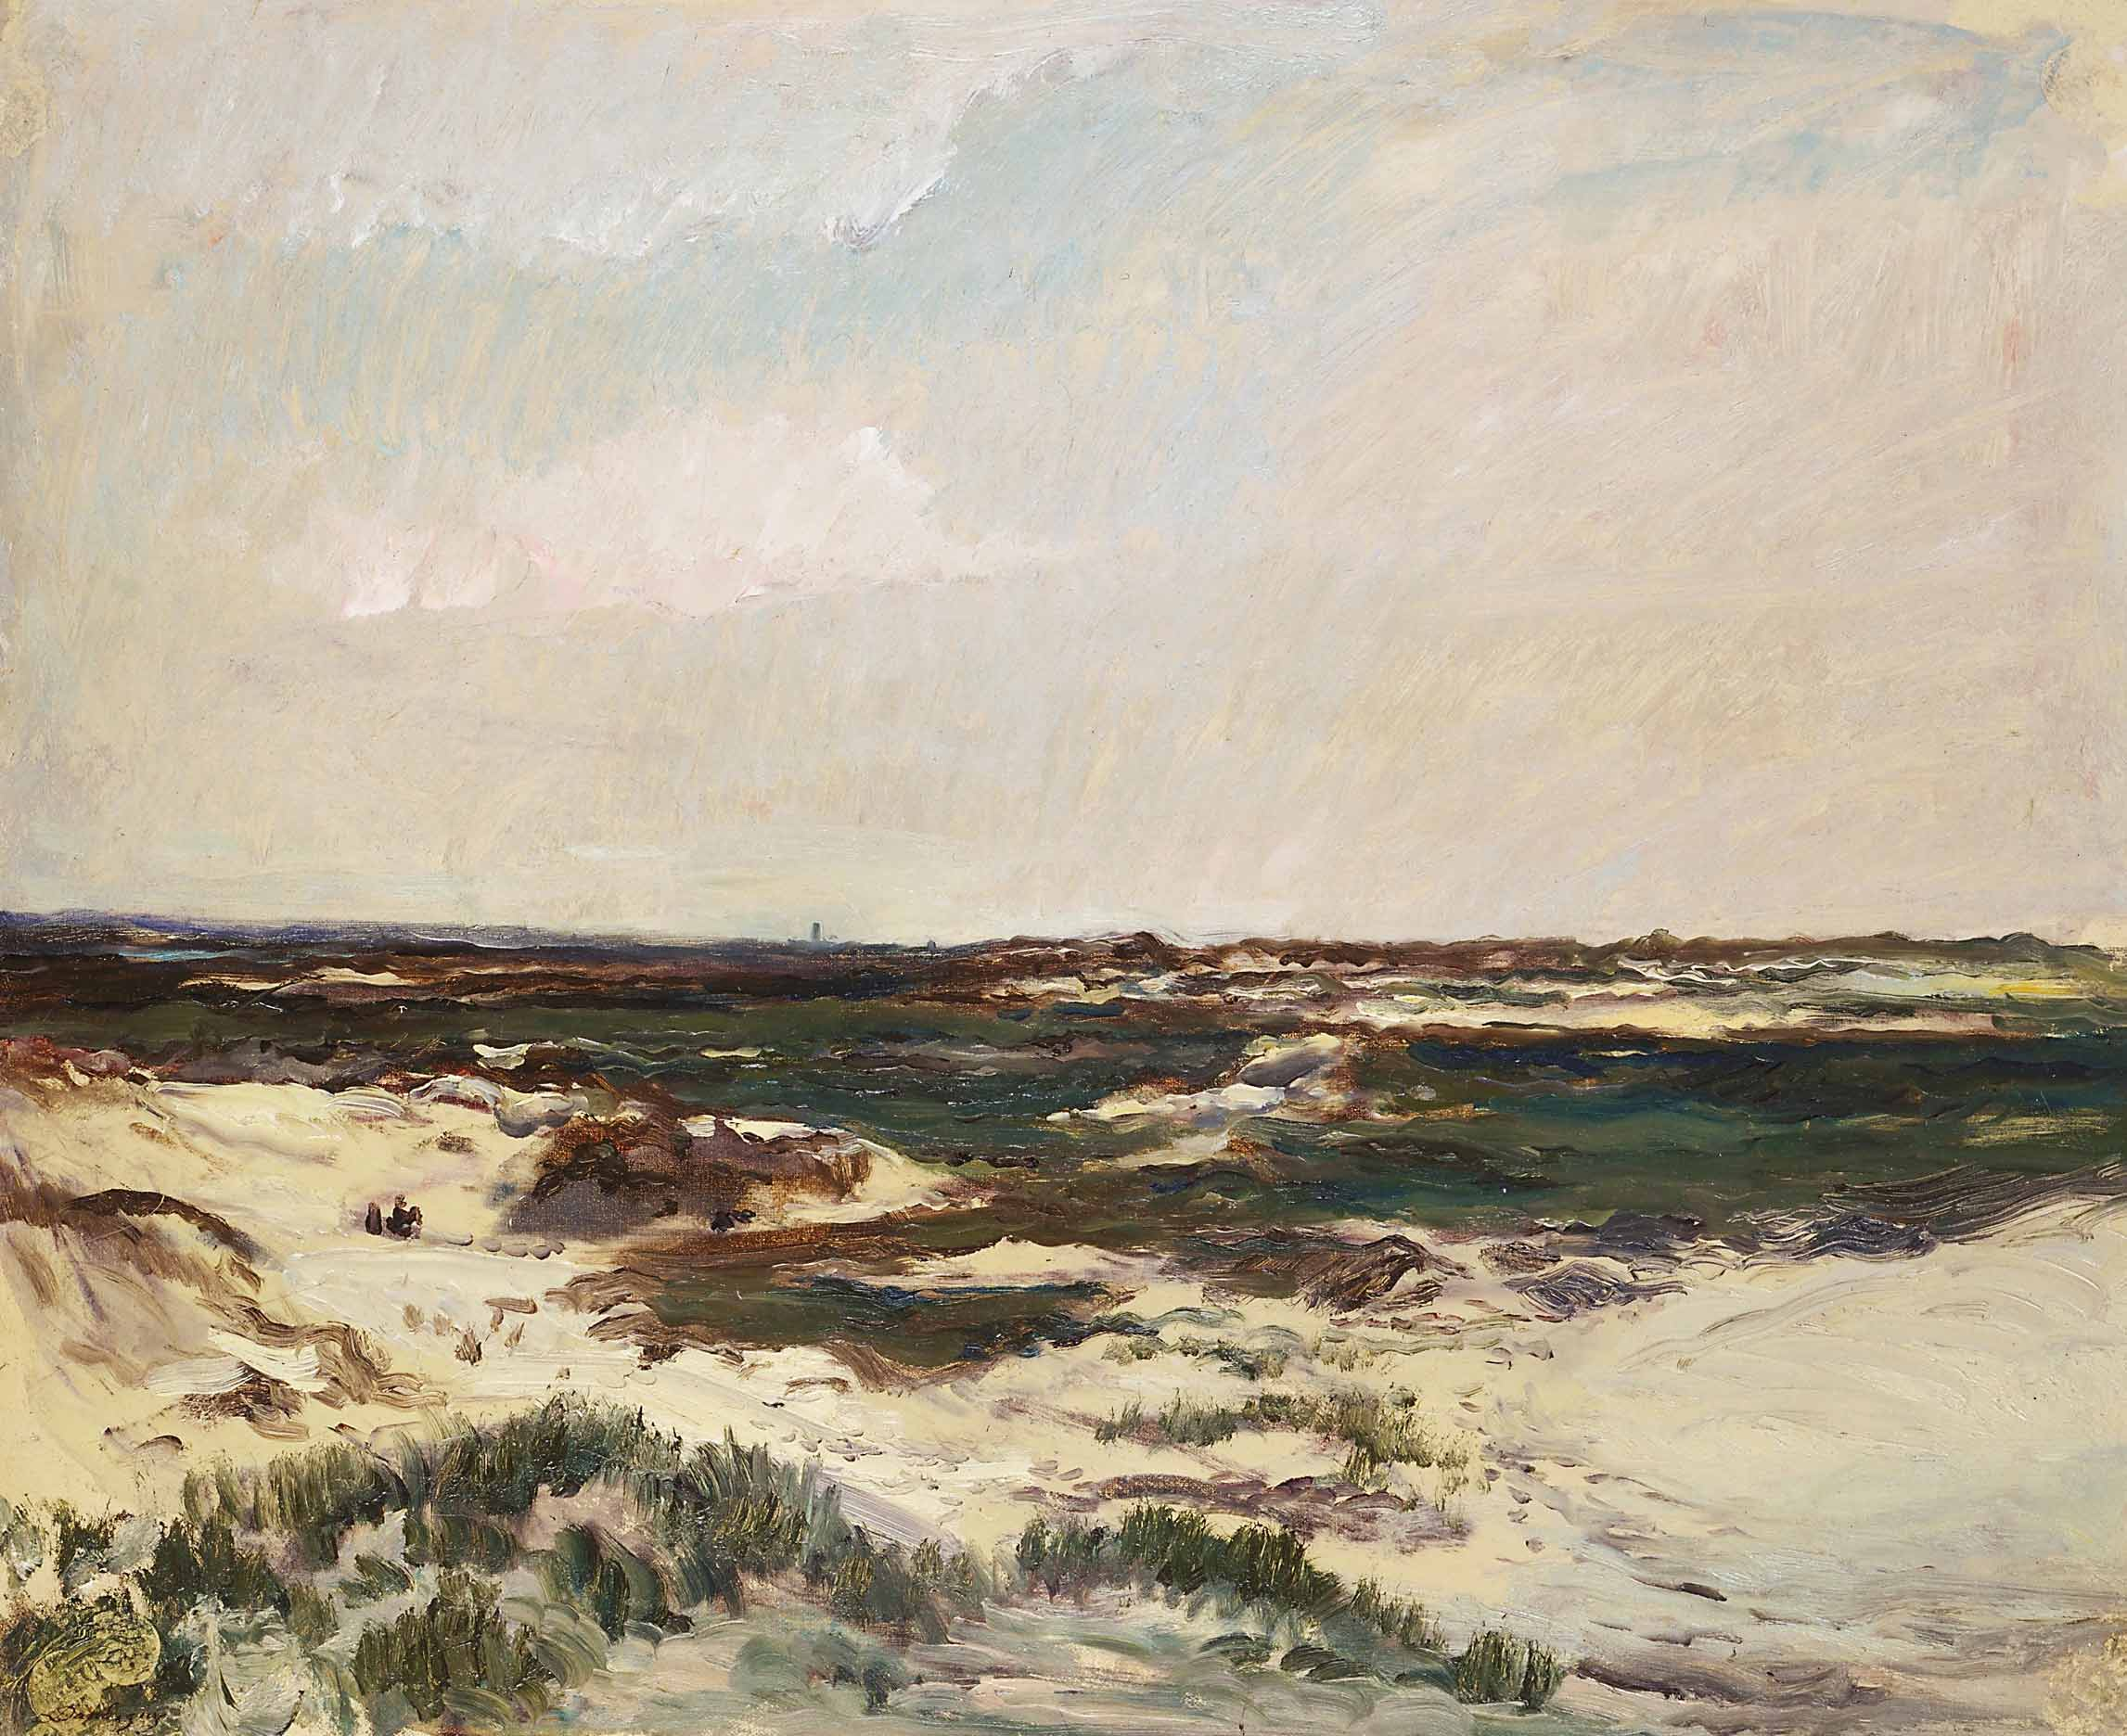 5-Daubigny-Dunes-at-Camiers-1871-Minneapolis